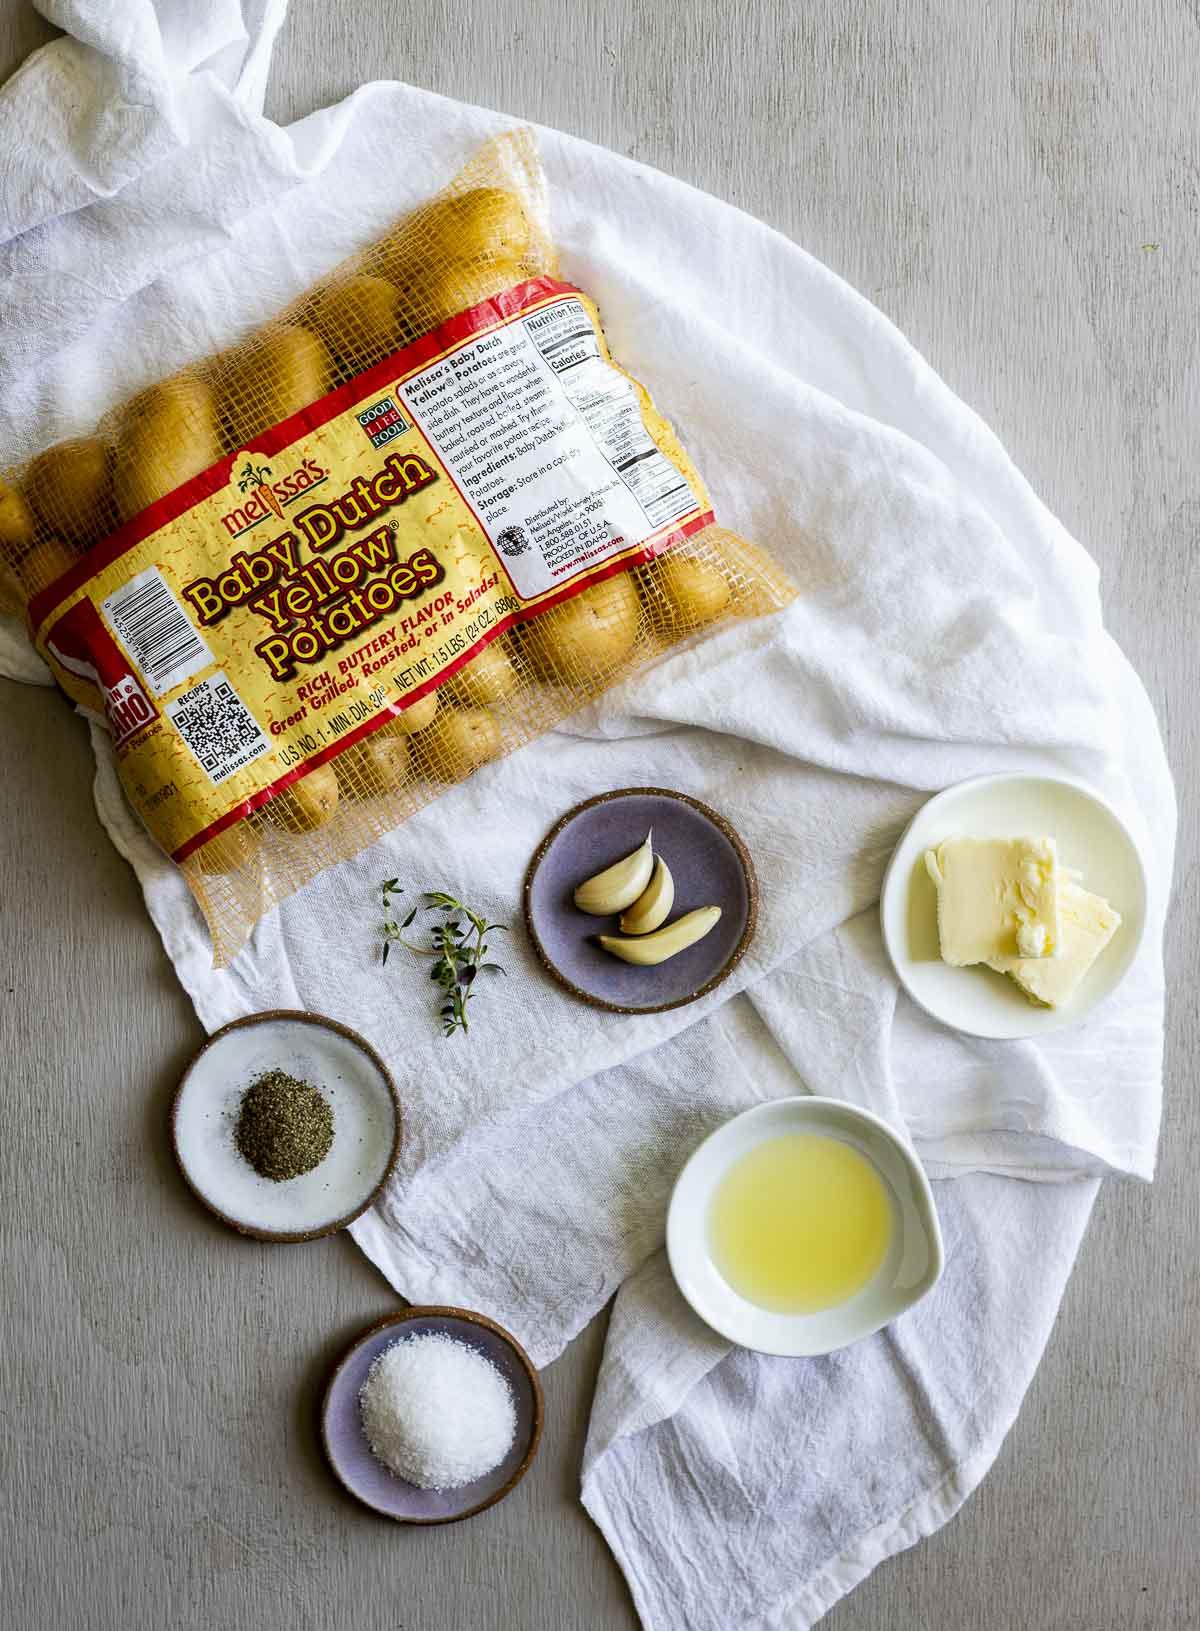 Ingredients to make sous vide potatoes arranged individually.